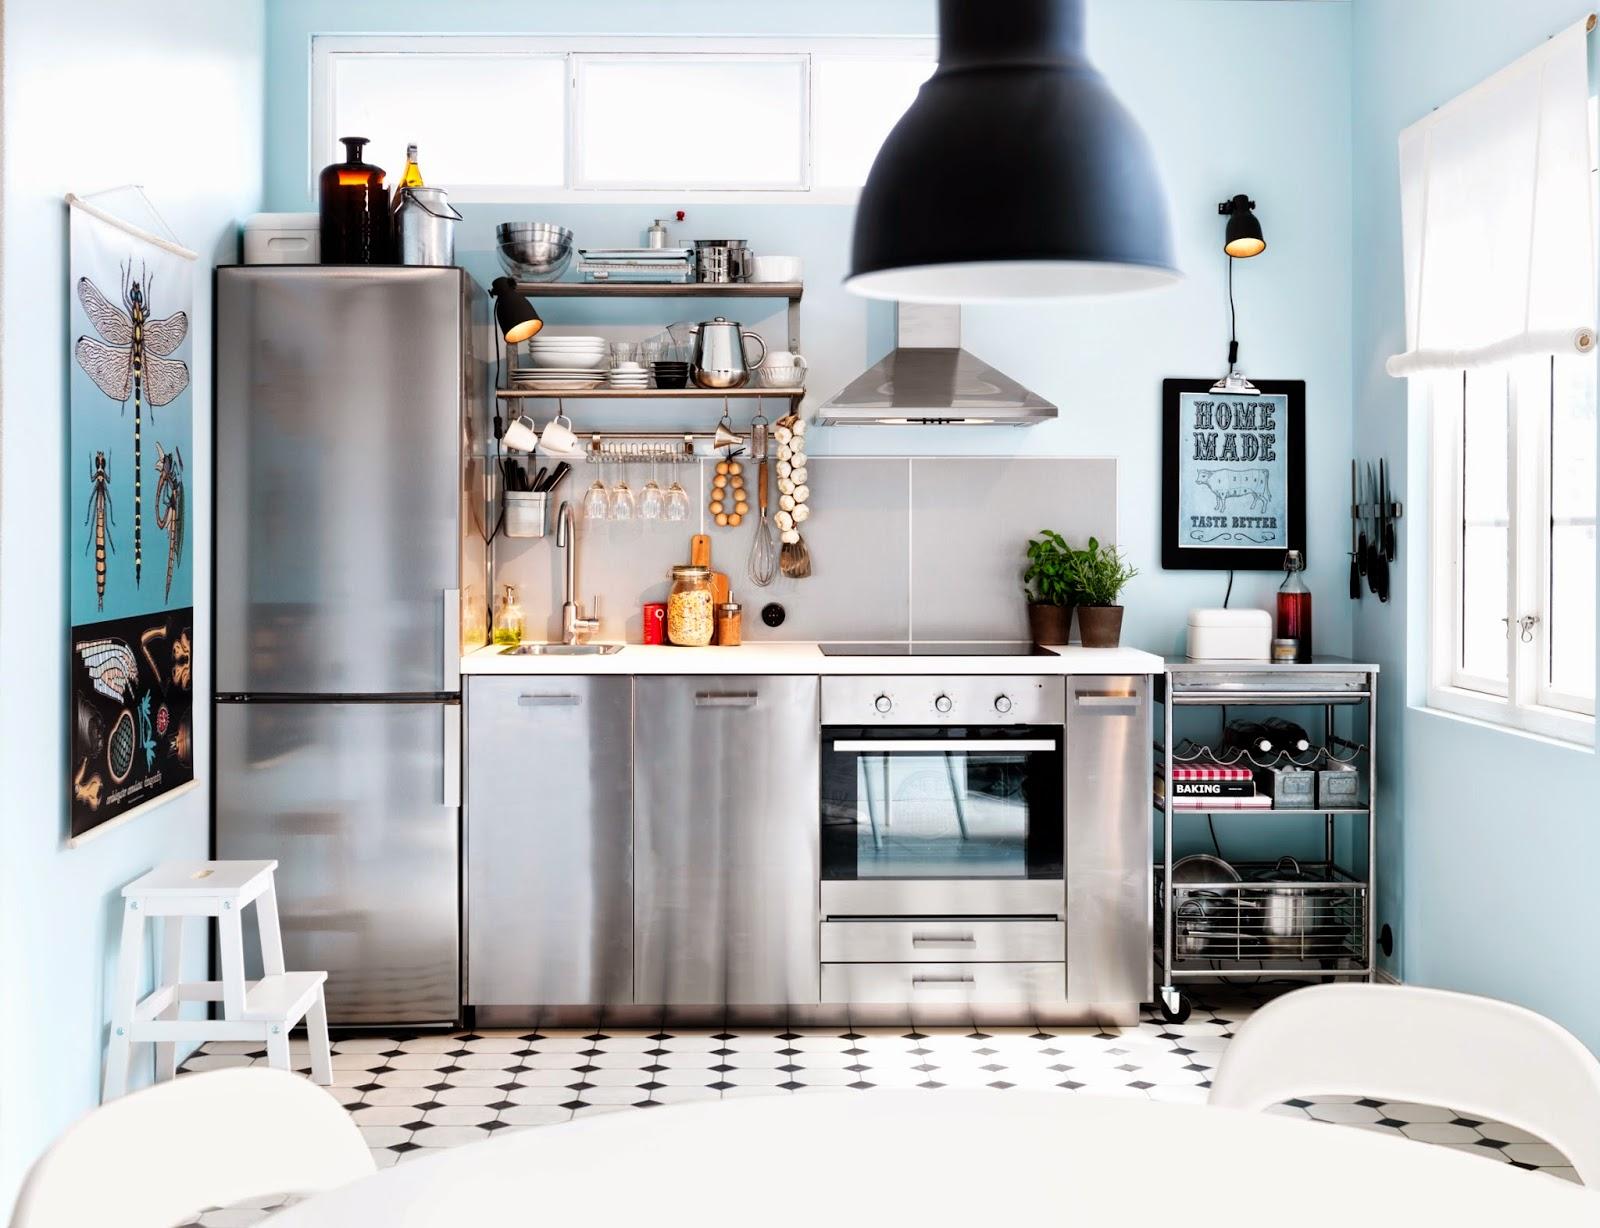 Catalogo Ikea Accessori Cucina. Best Catalogo Ikea Accessori ...